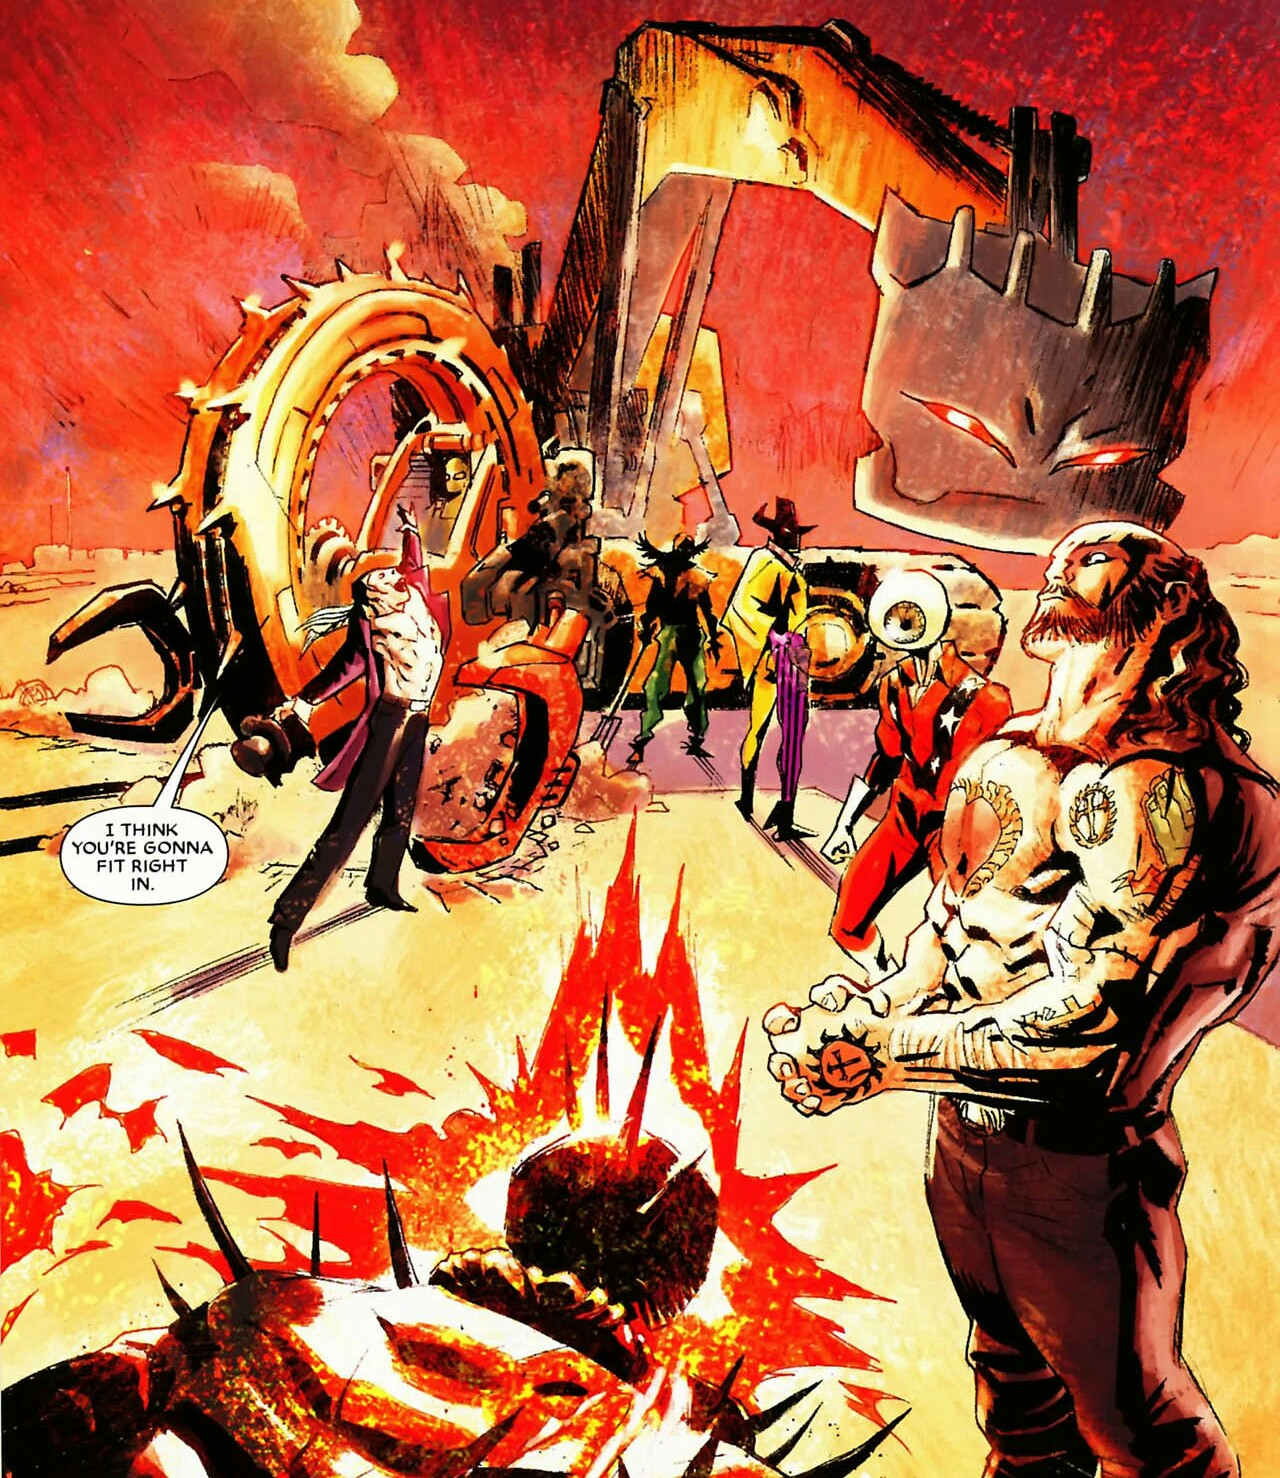 Ghost Rider Assassination League (Earth-616) | Marvel